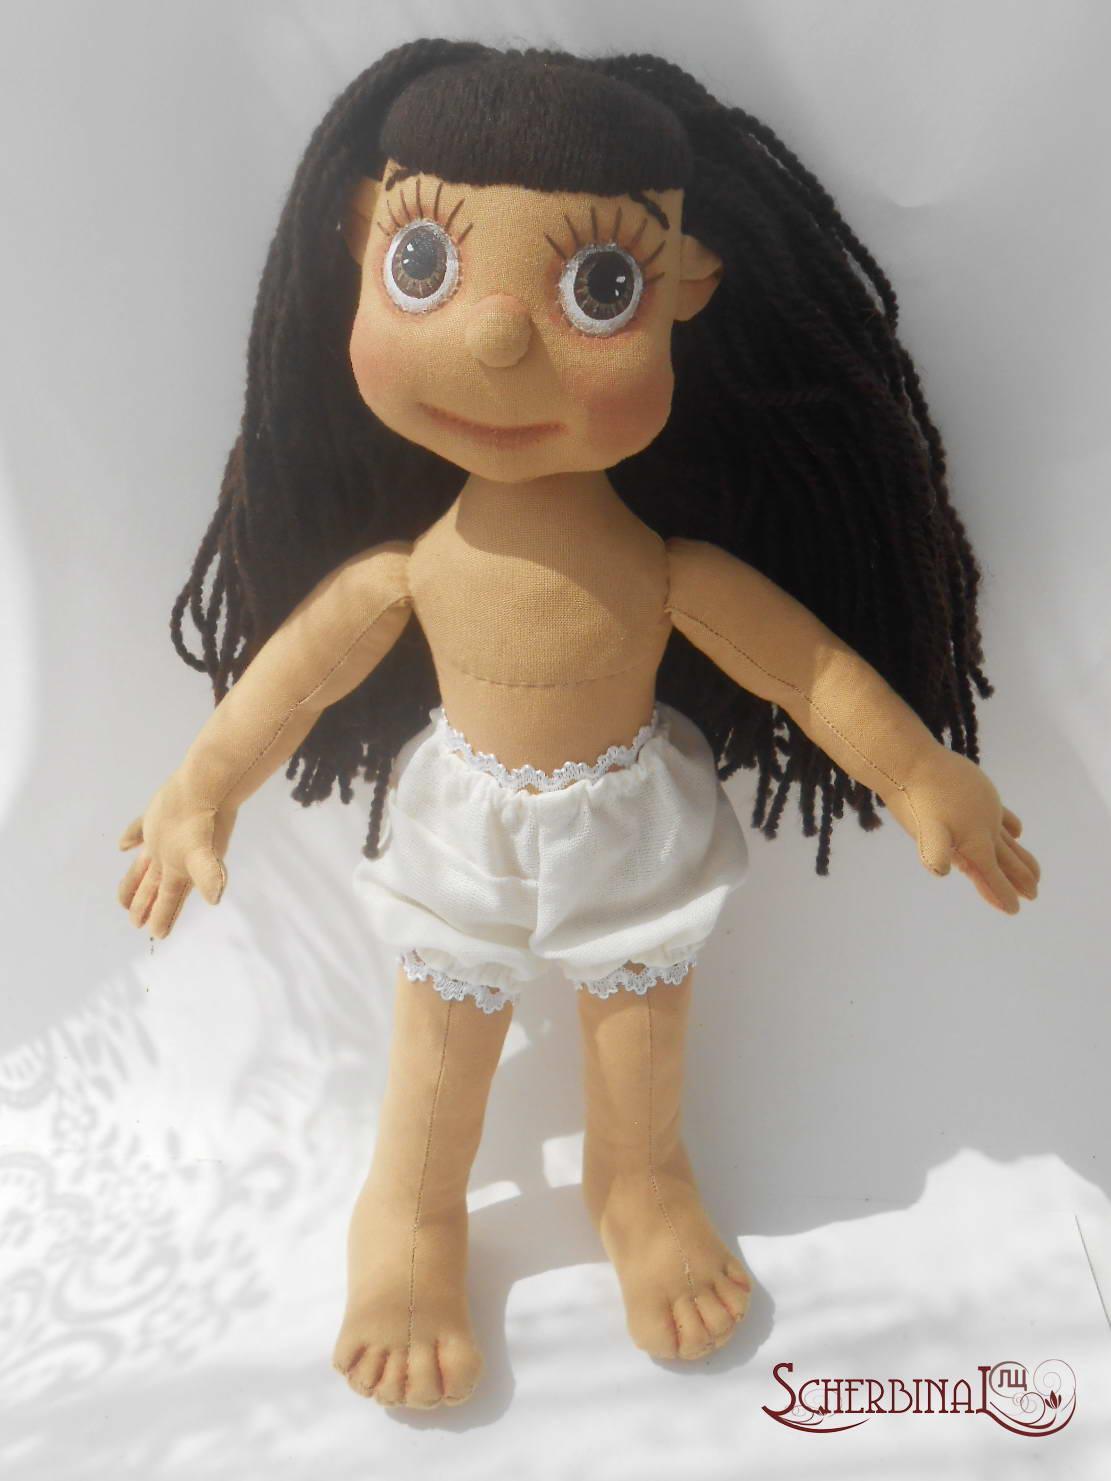 волосы для текстильной куклы, мастер-класс